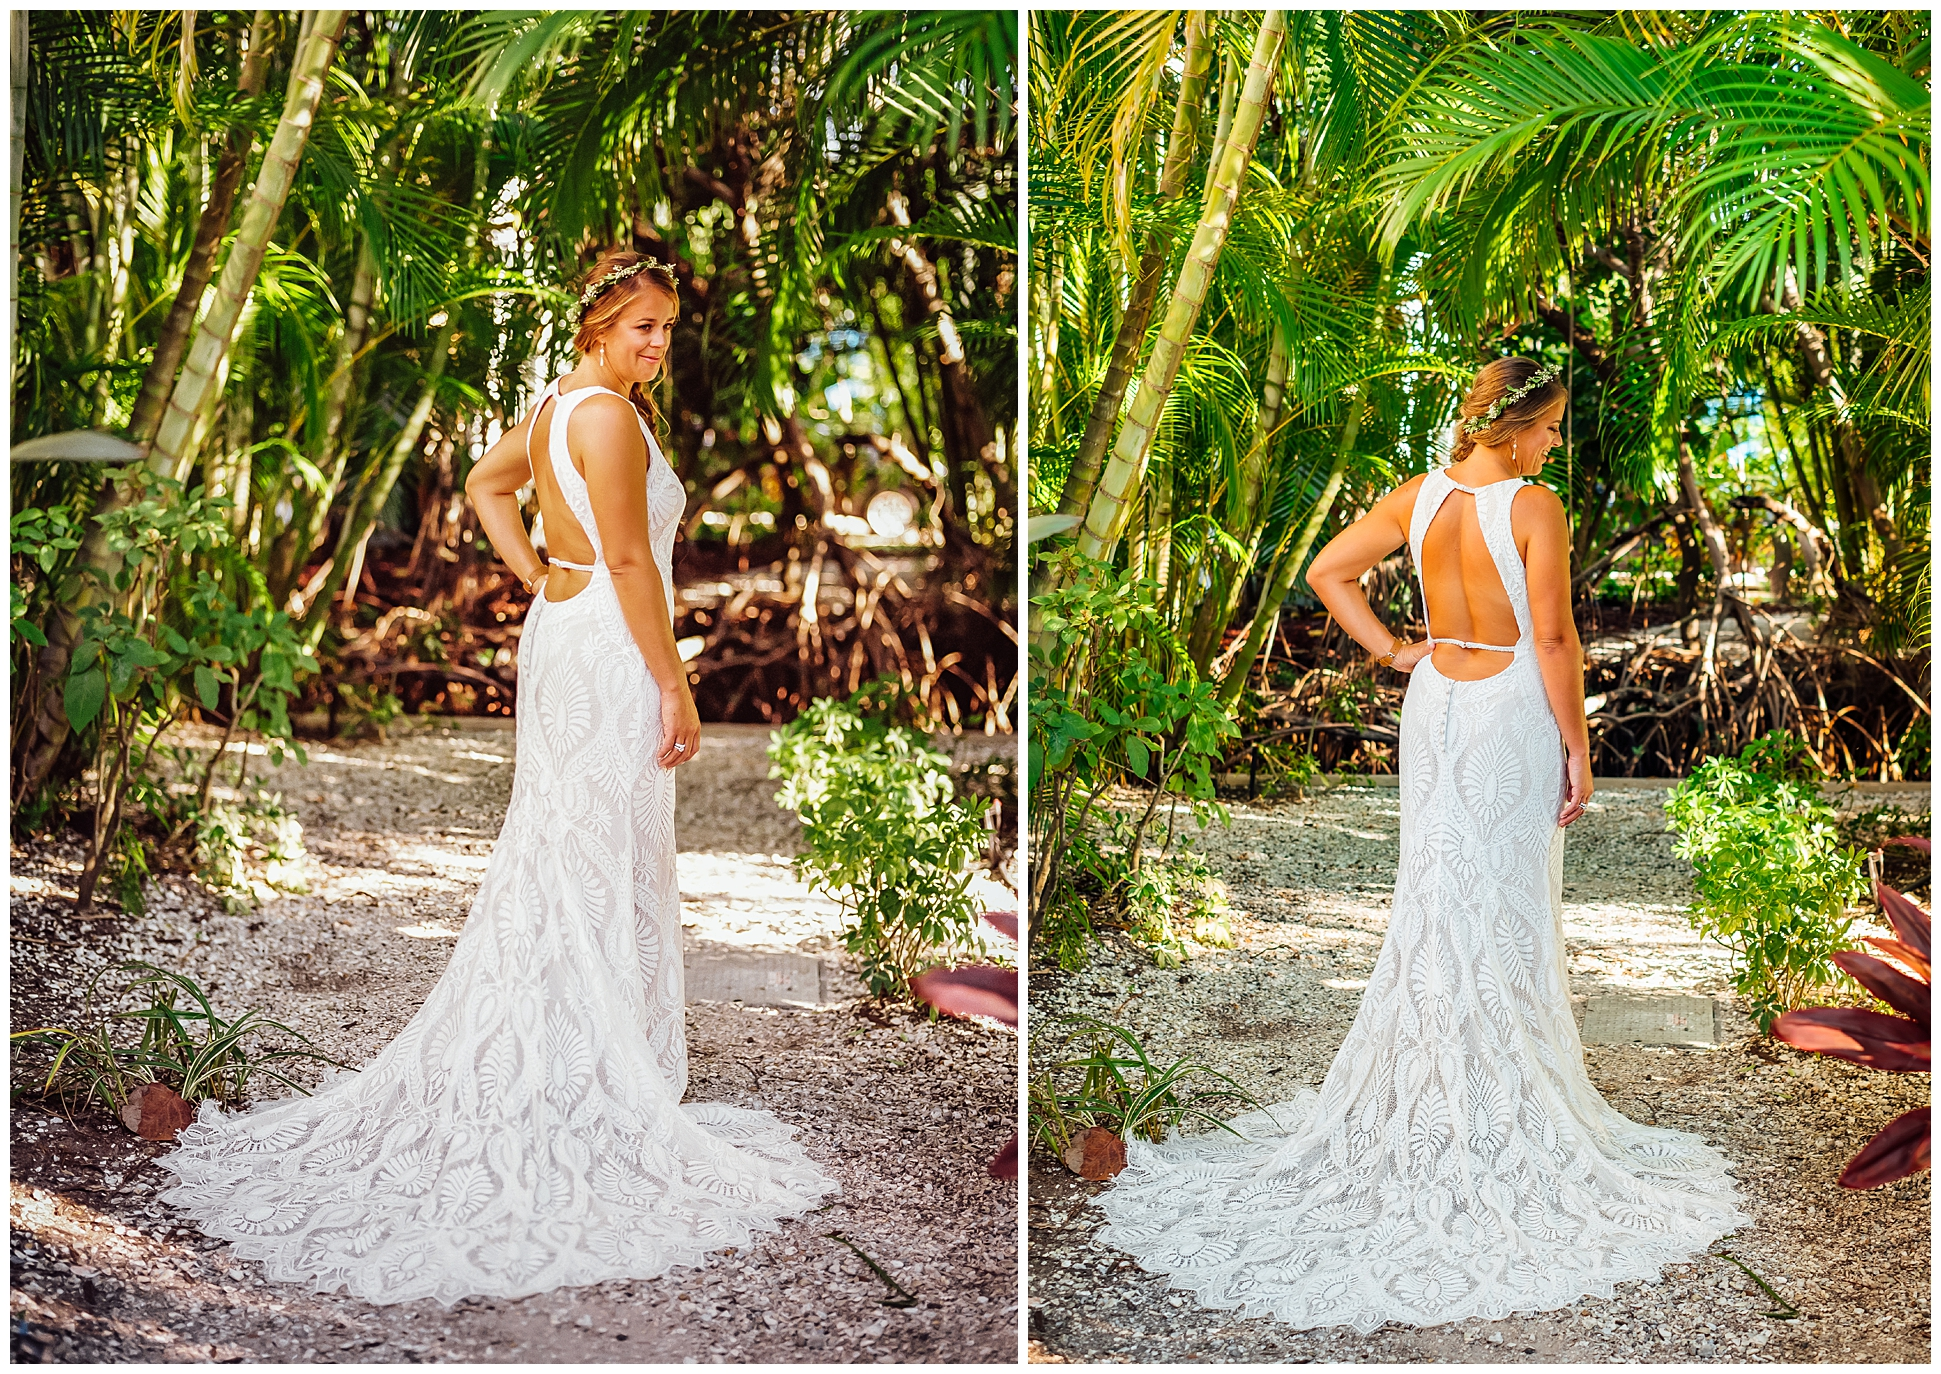 medium-format-film-vs-digital-wedding-photography-florida-beach_0003.jpg